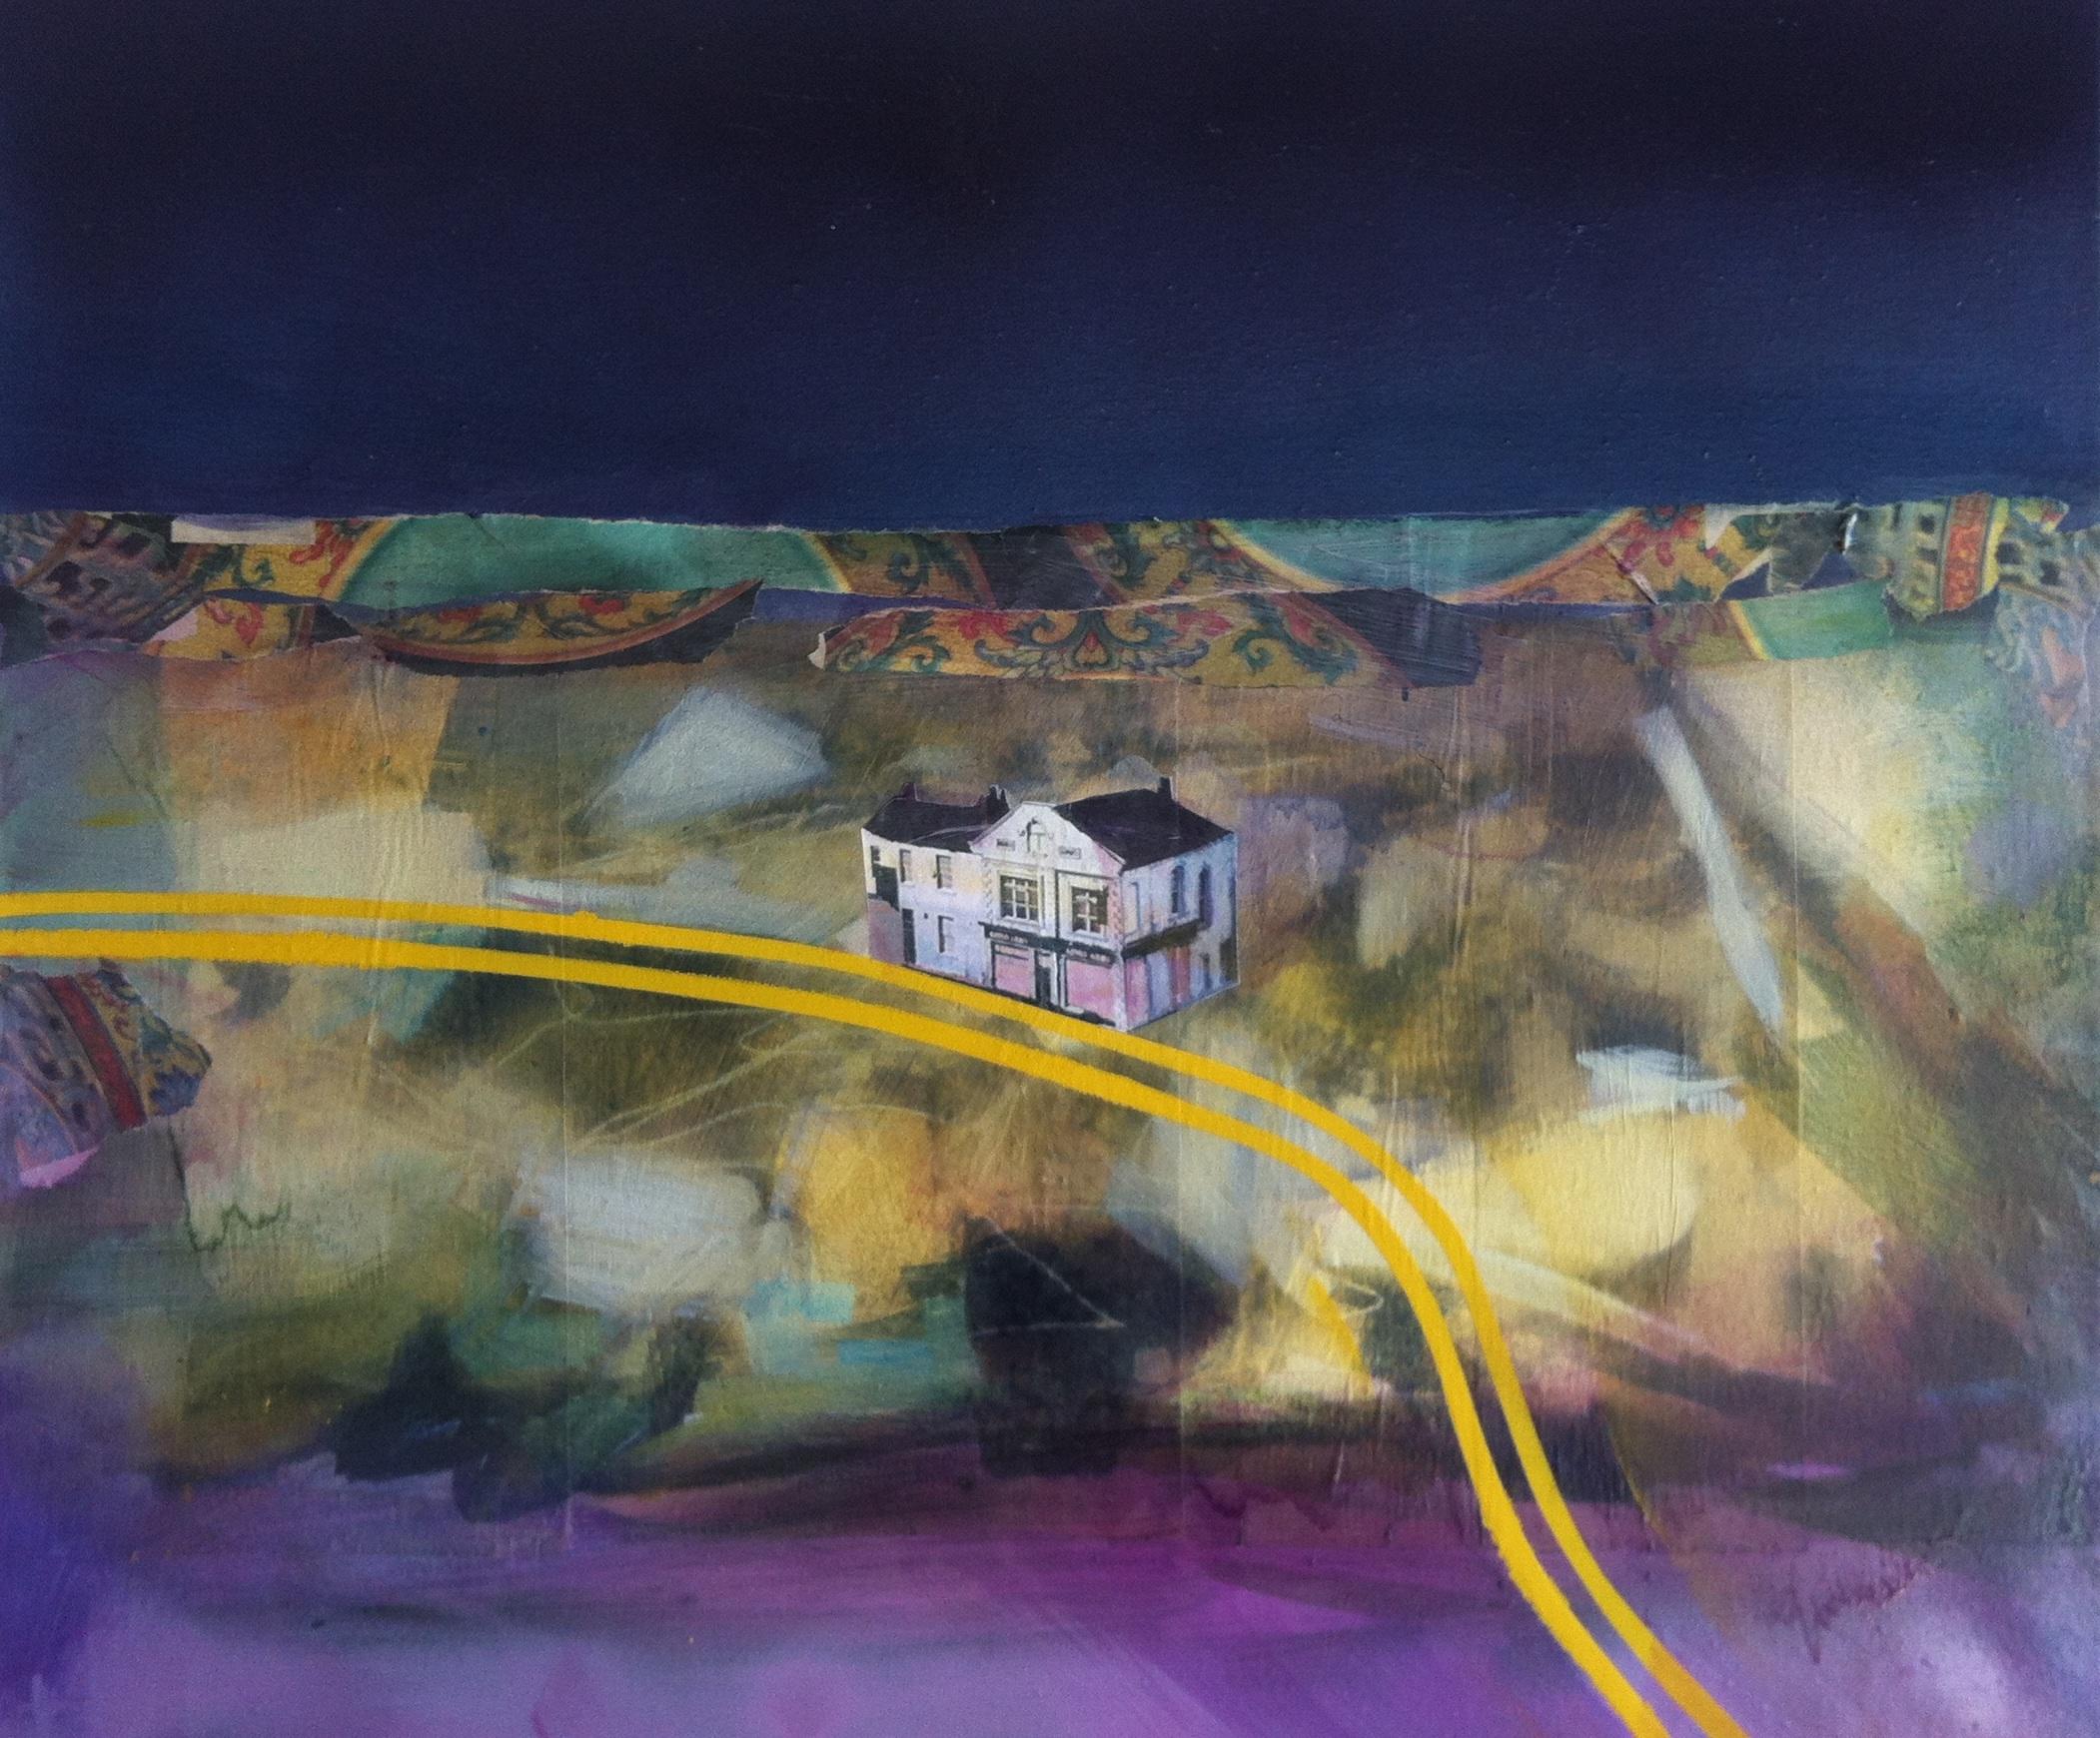 Gillian Holding Edgelands (King's Arms) (2013) mixed media on canvas.jpg